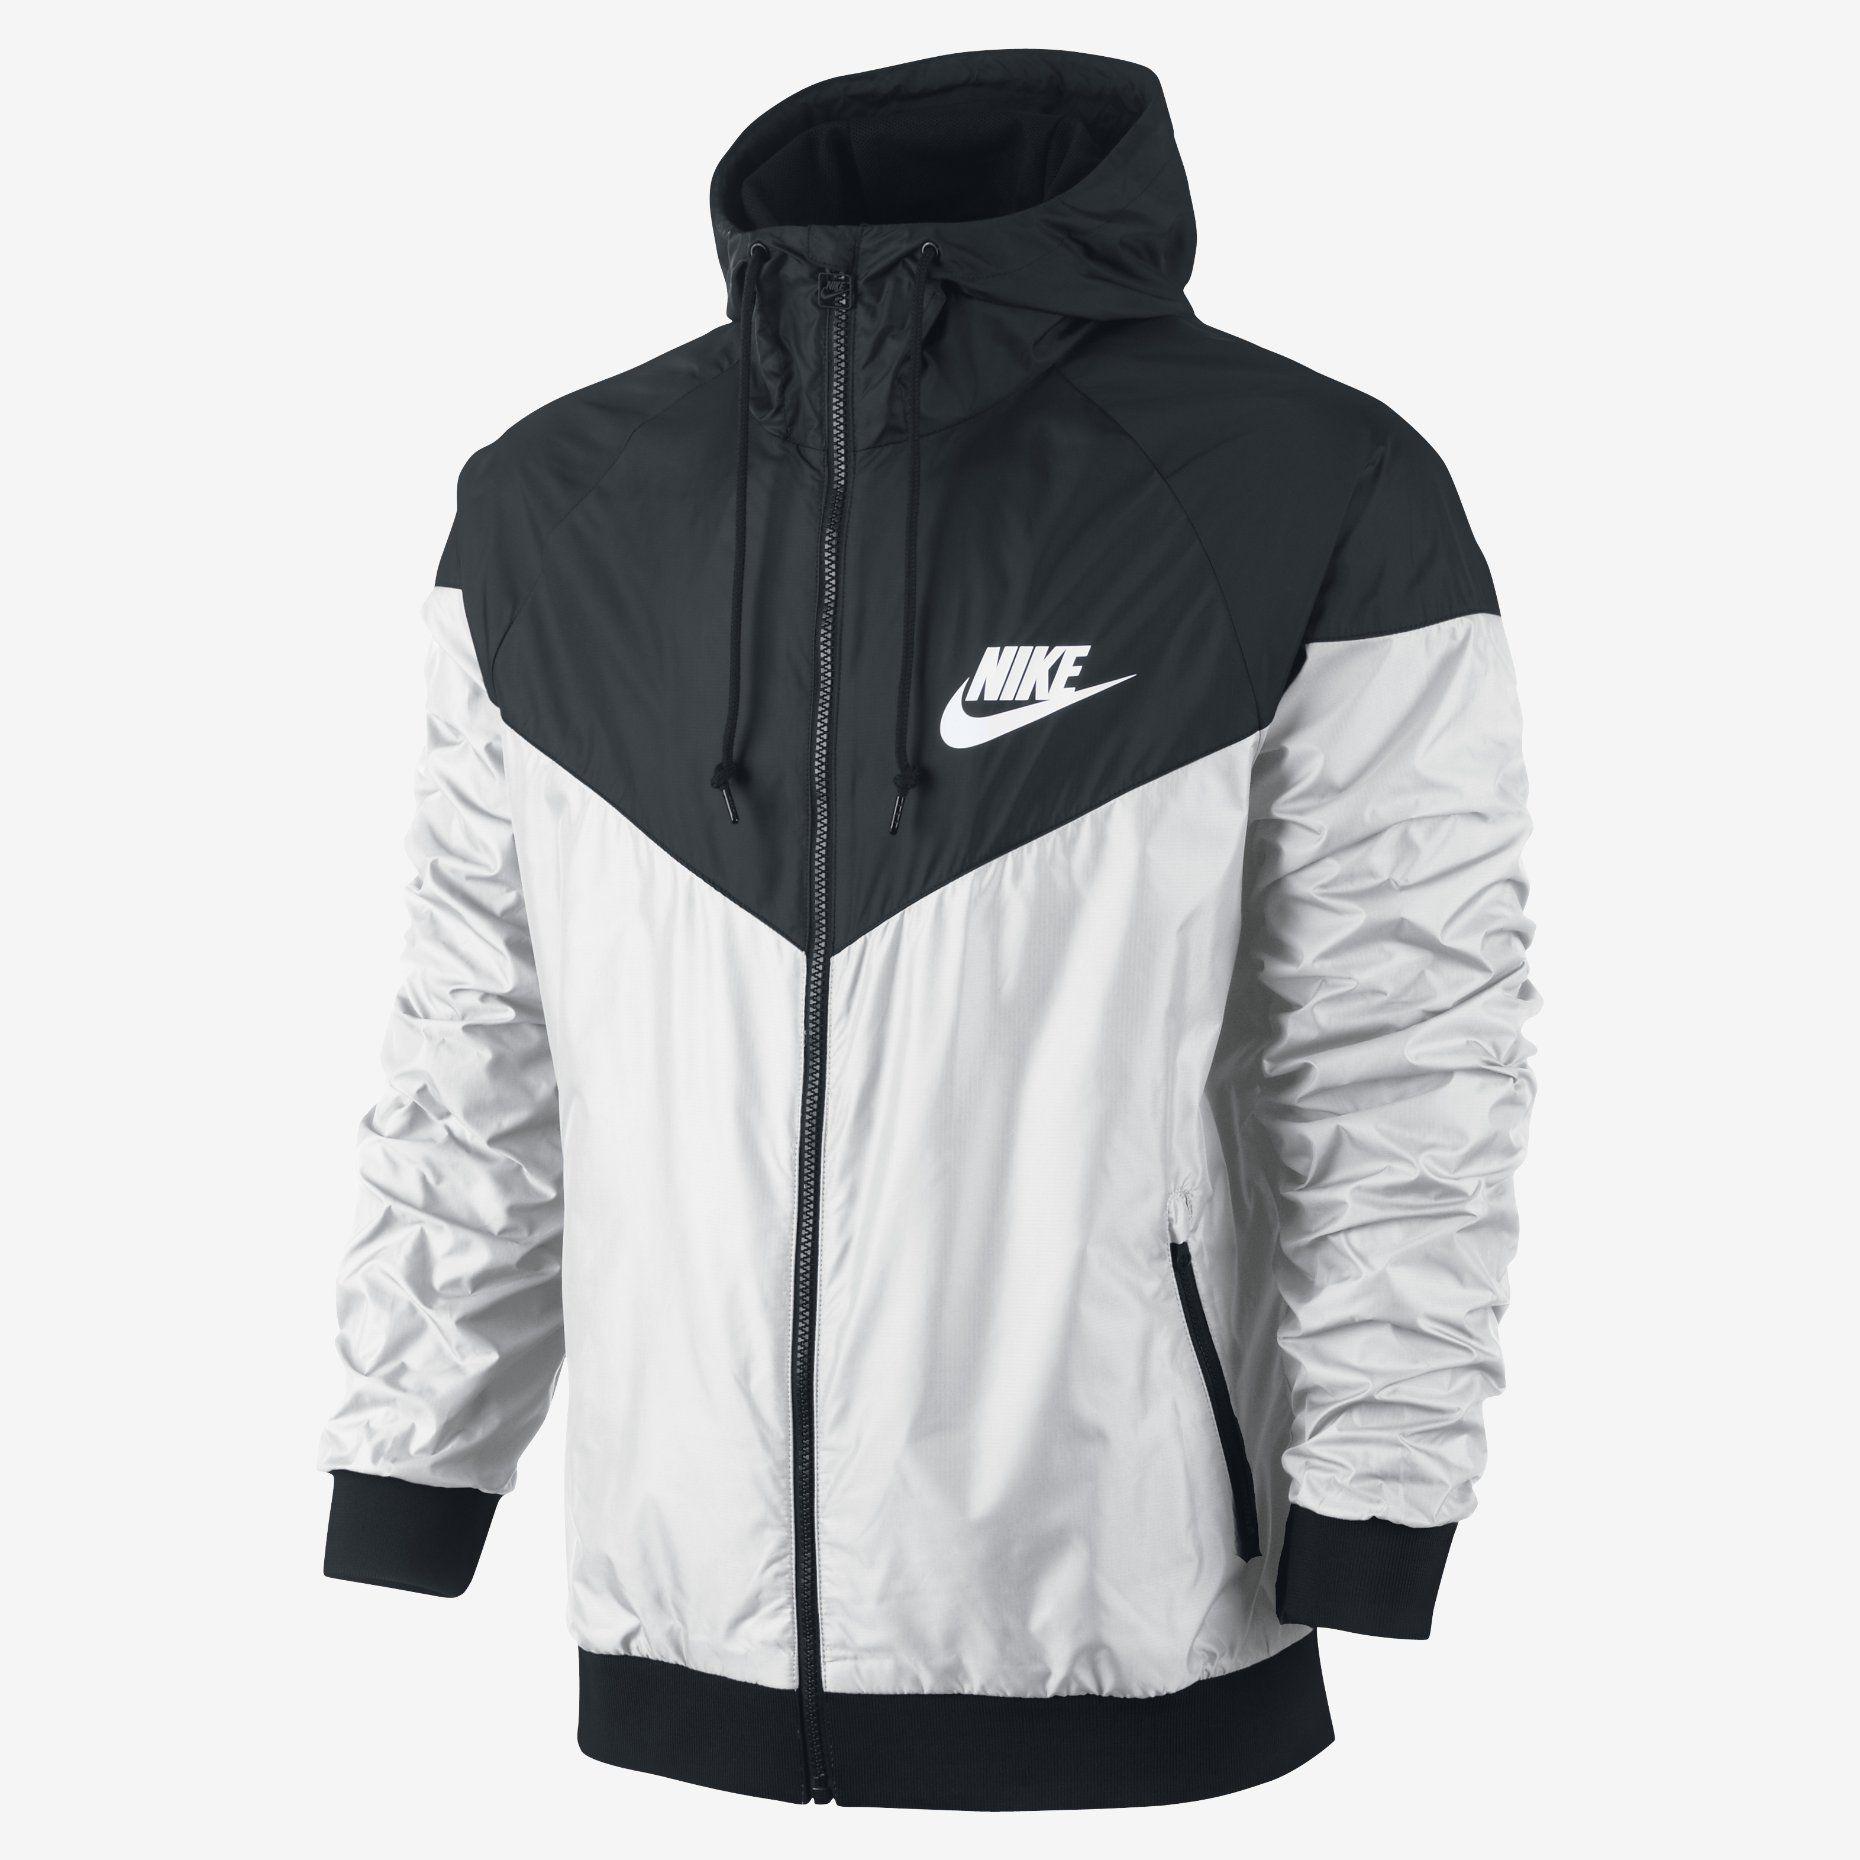 b449aac569 Nike Windbreaker